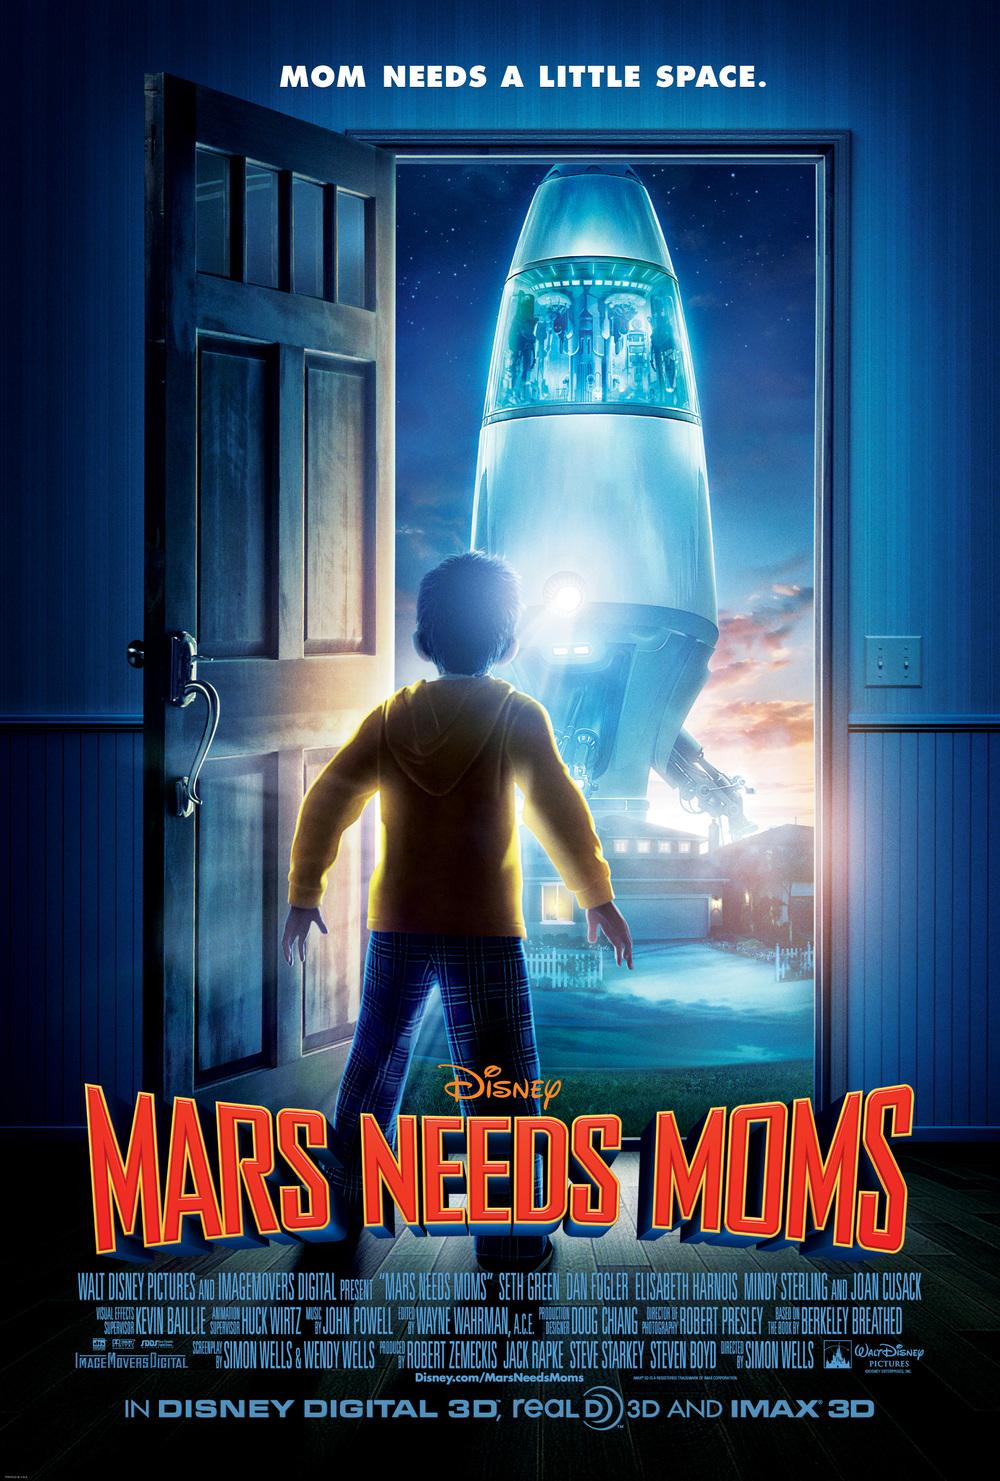 mars_needs_moms_poster_01.jpg